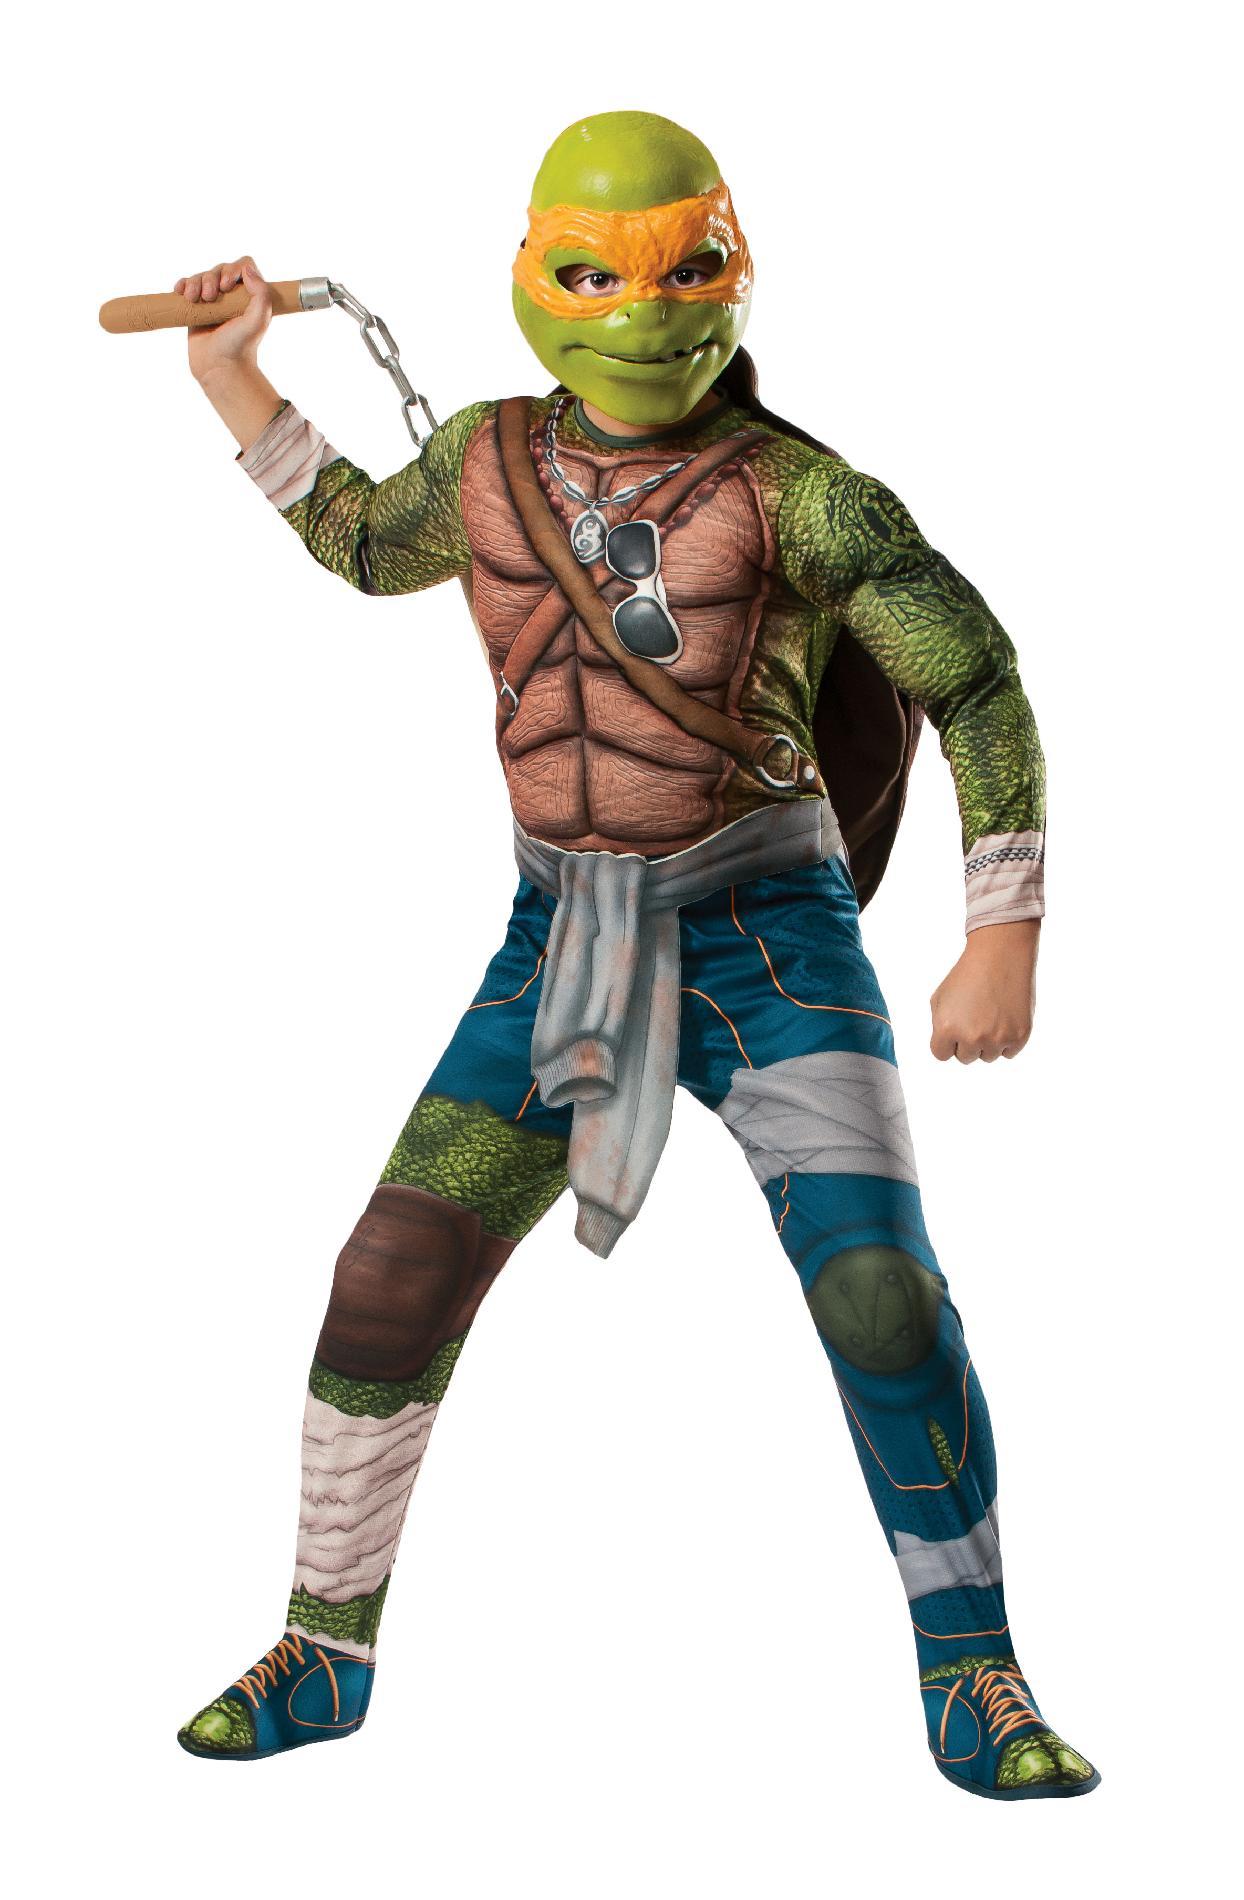 Teenage Mutant Ninja Turtles Michelangelo Deluxe Muscle Boys' Movie Version Halloween Costume PartNumber: 009VA76629712P MfgPartNumber: 888975